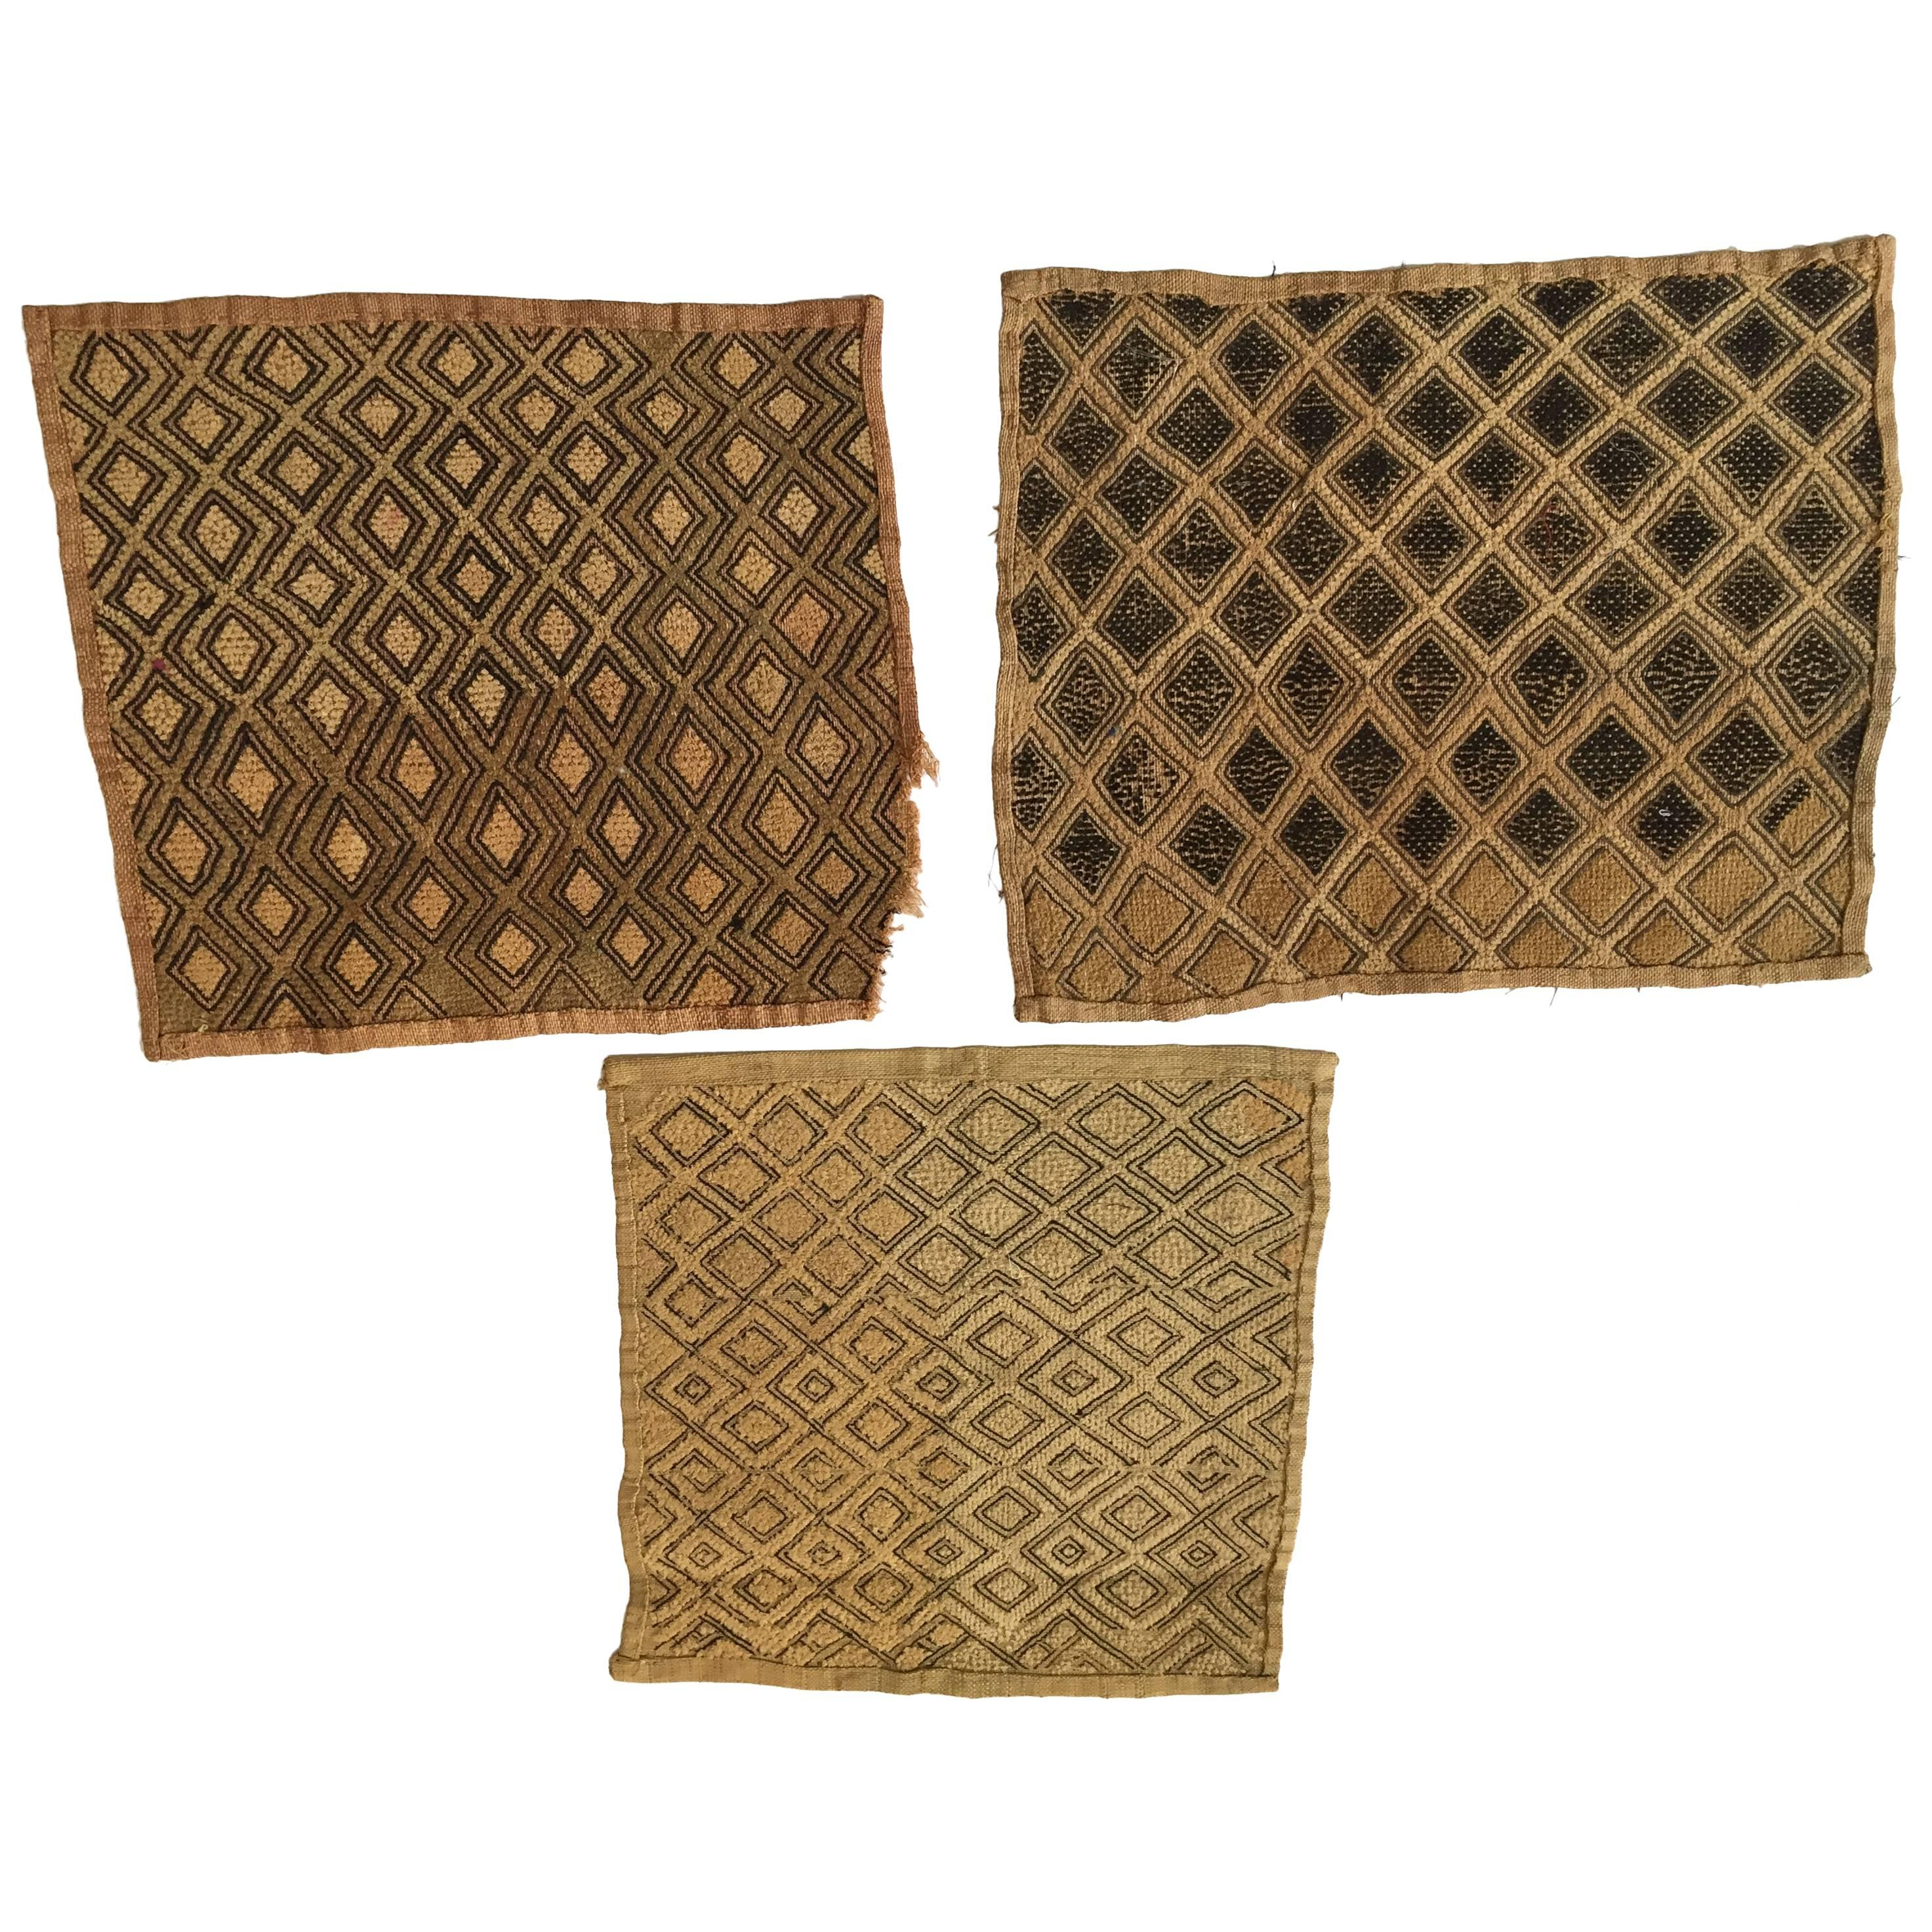 Handwoven Raffia Kuba Textiles from Congo Africa, Set of Three